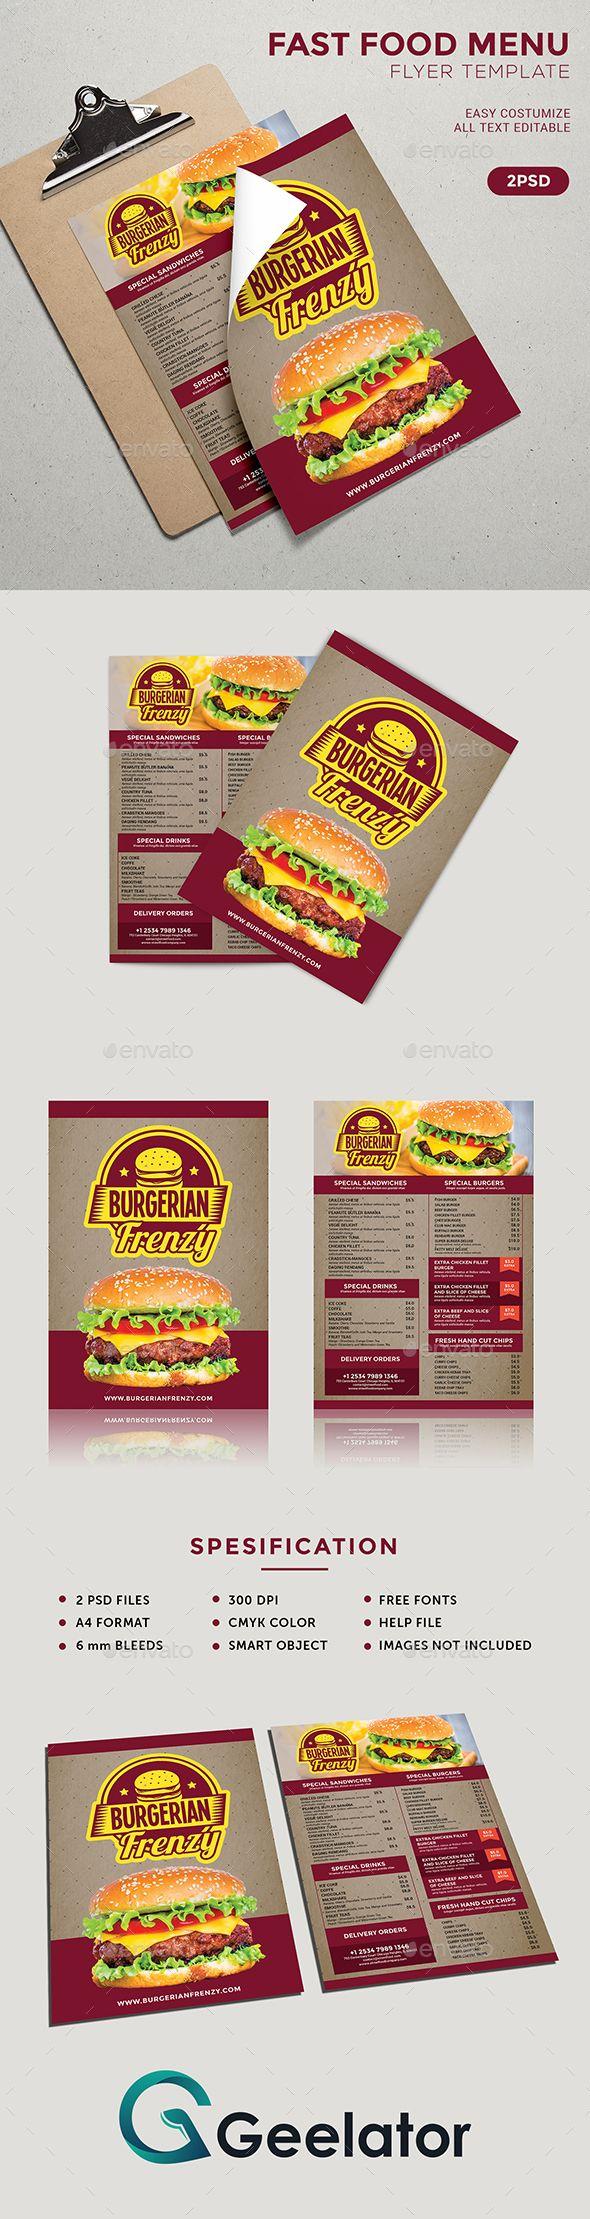 Fast Food Menu Flyer Template - #burger #business #cafe #clean #coffe #creative #deliciousmenu #elegant #fastfood #flyer #food #foodmenu #magazinead #menu #menudesign #menutemplates #onepagemenu #poster #printtemplate #promotionrestaurant #restaurantmenu #retro #retromenu #sandwich #streetmenu #style #vintage #vintagemenu